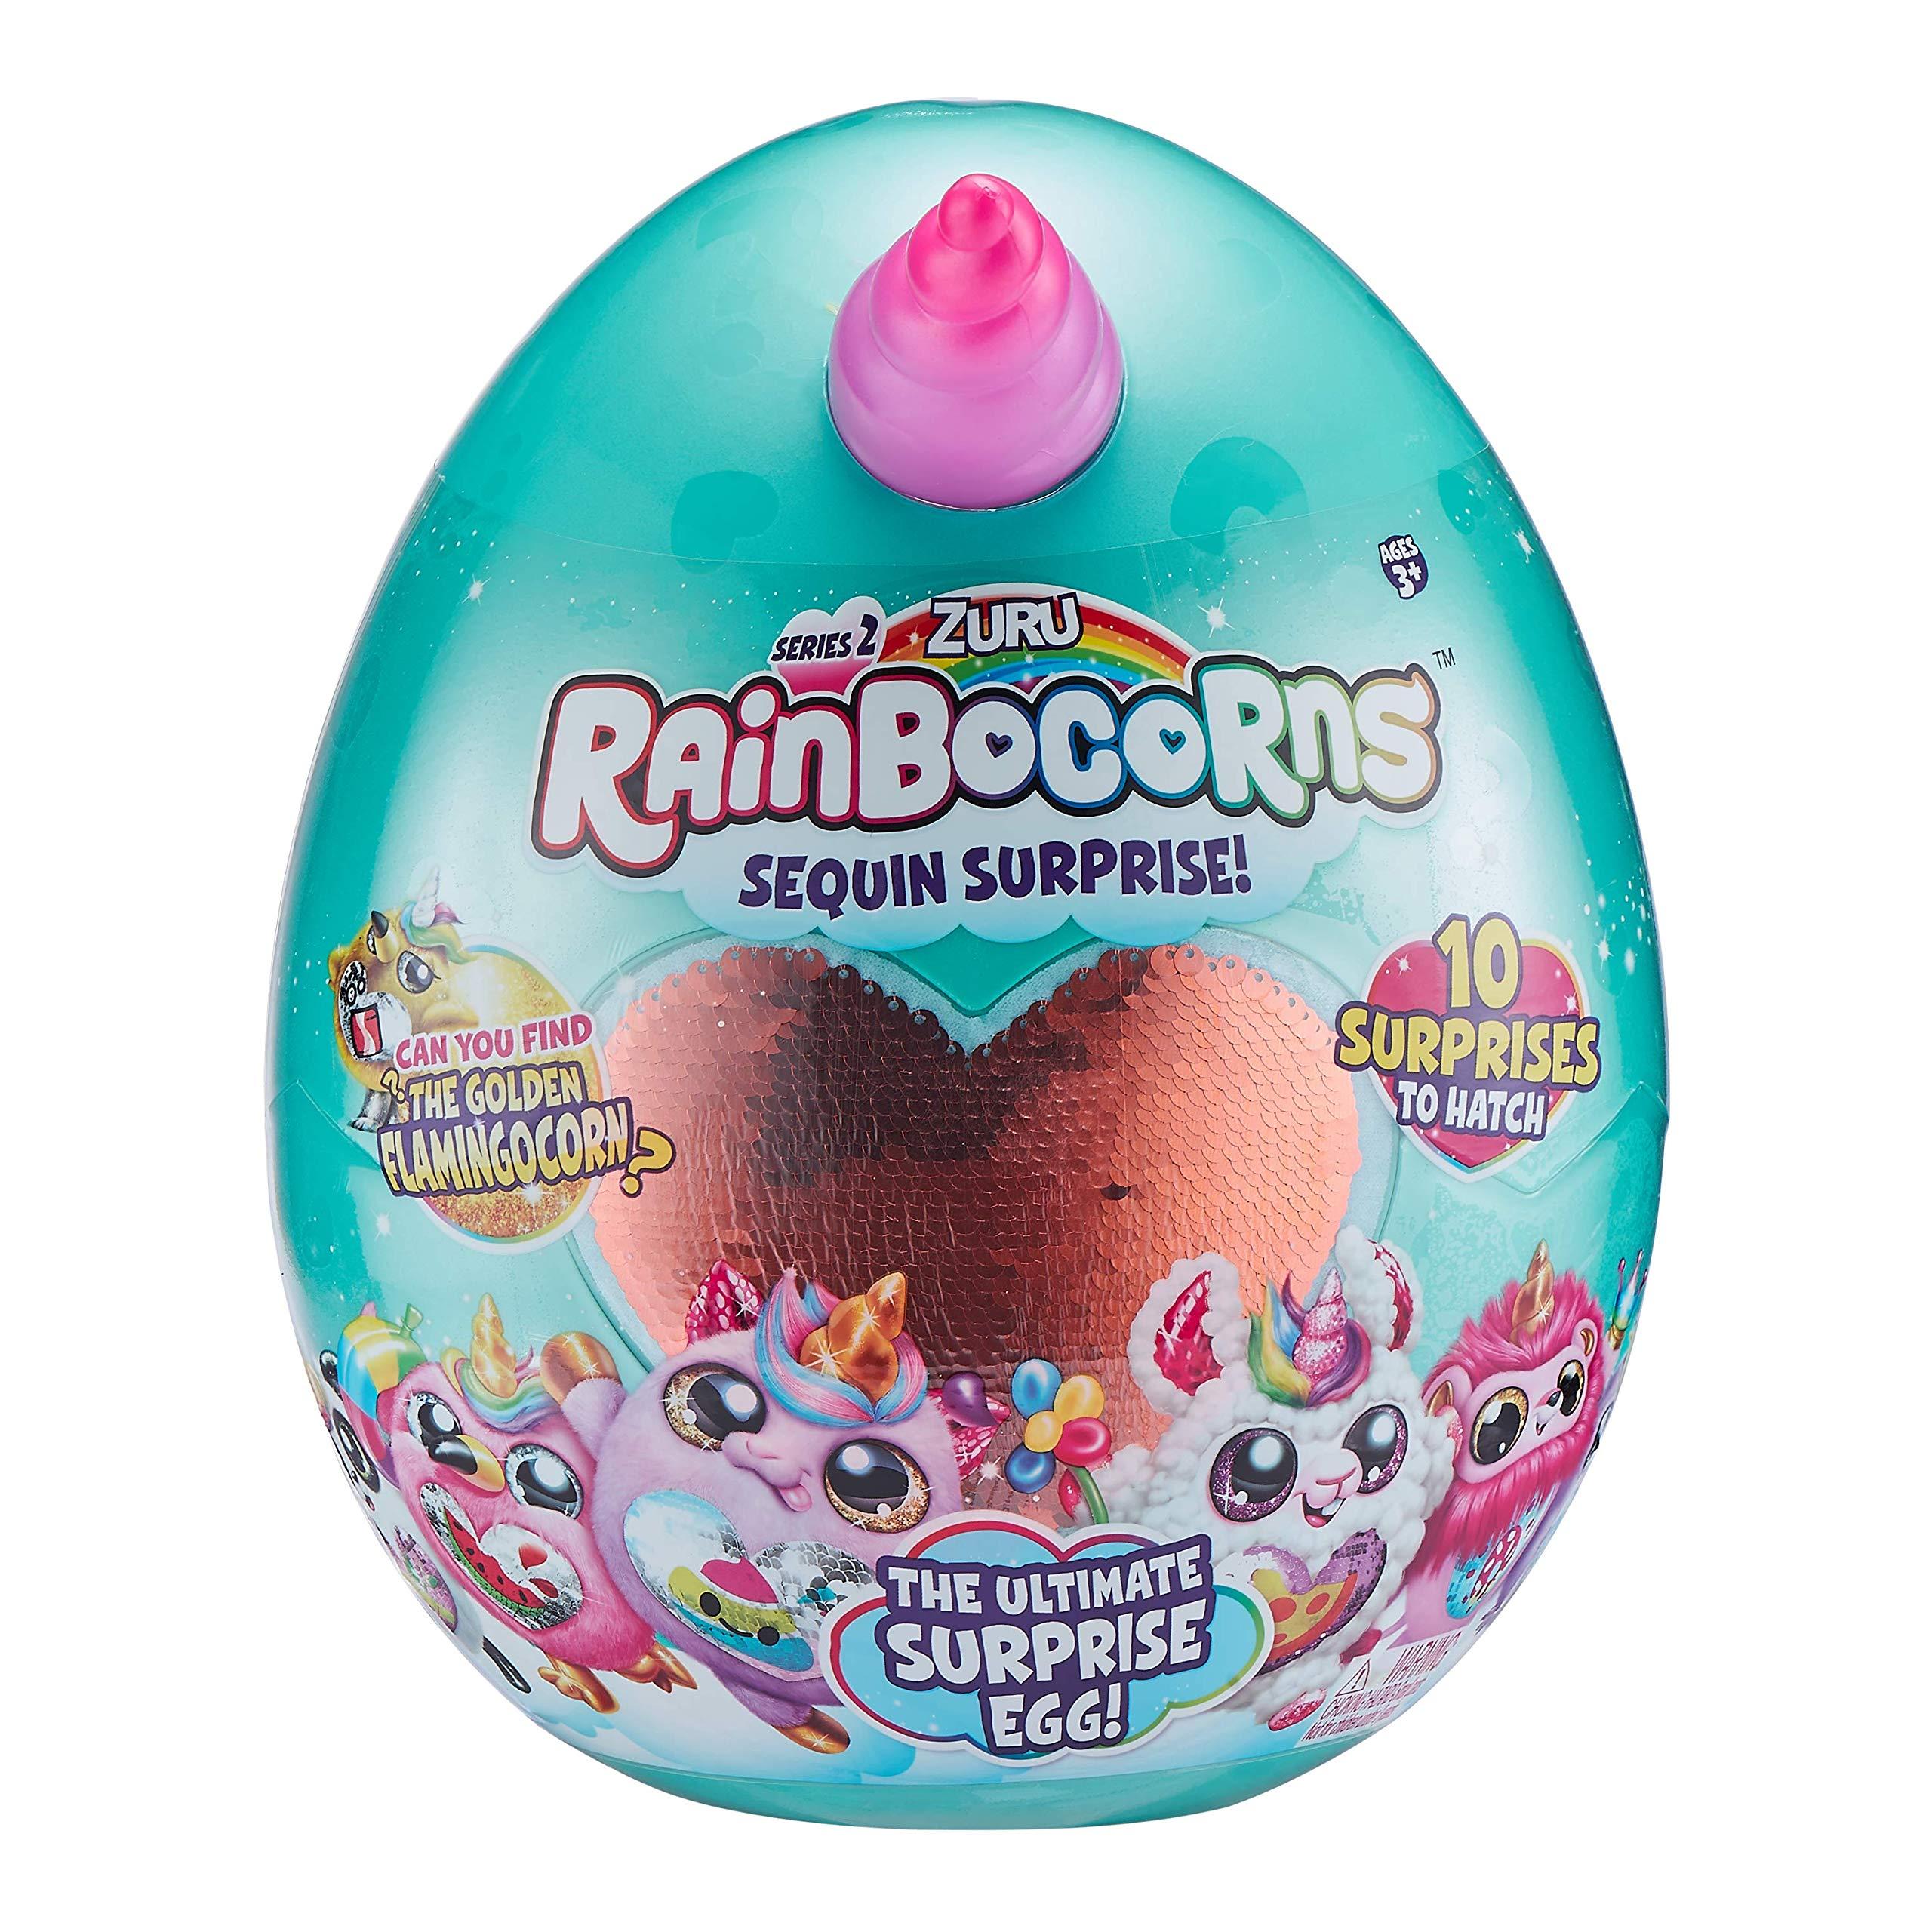 Rainbocorns Series 2 Ultimate Surprise Egg by ZURU by Rainbocorns